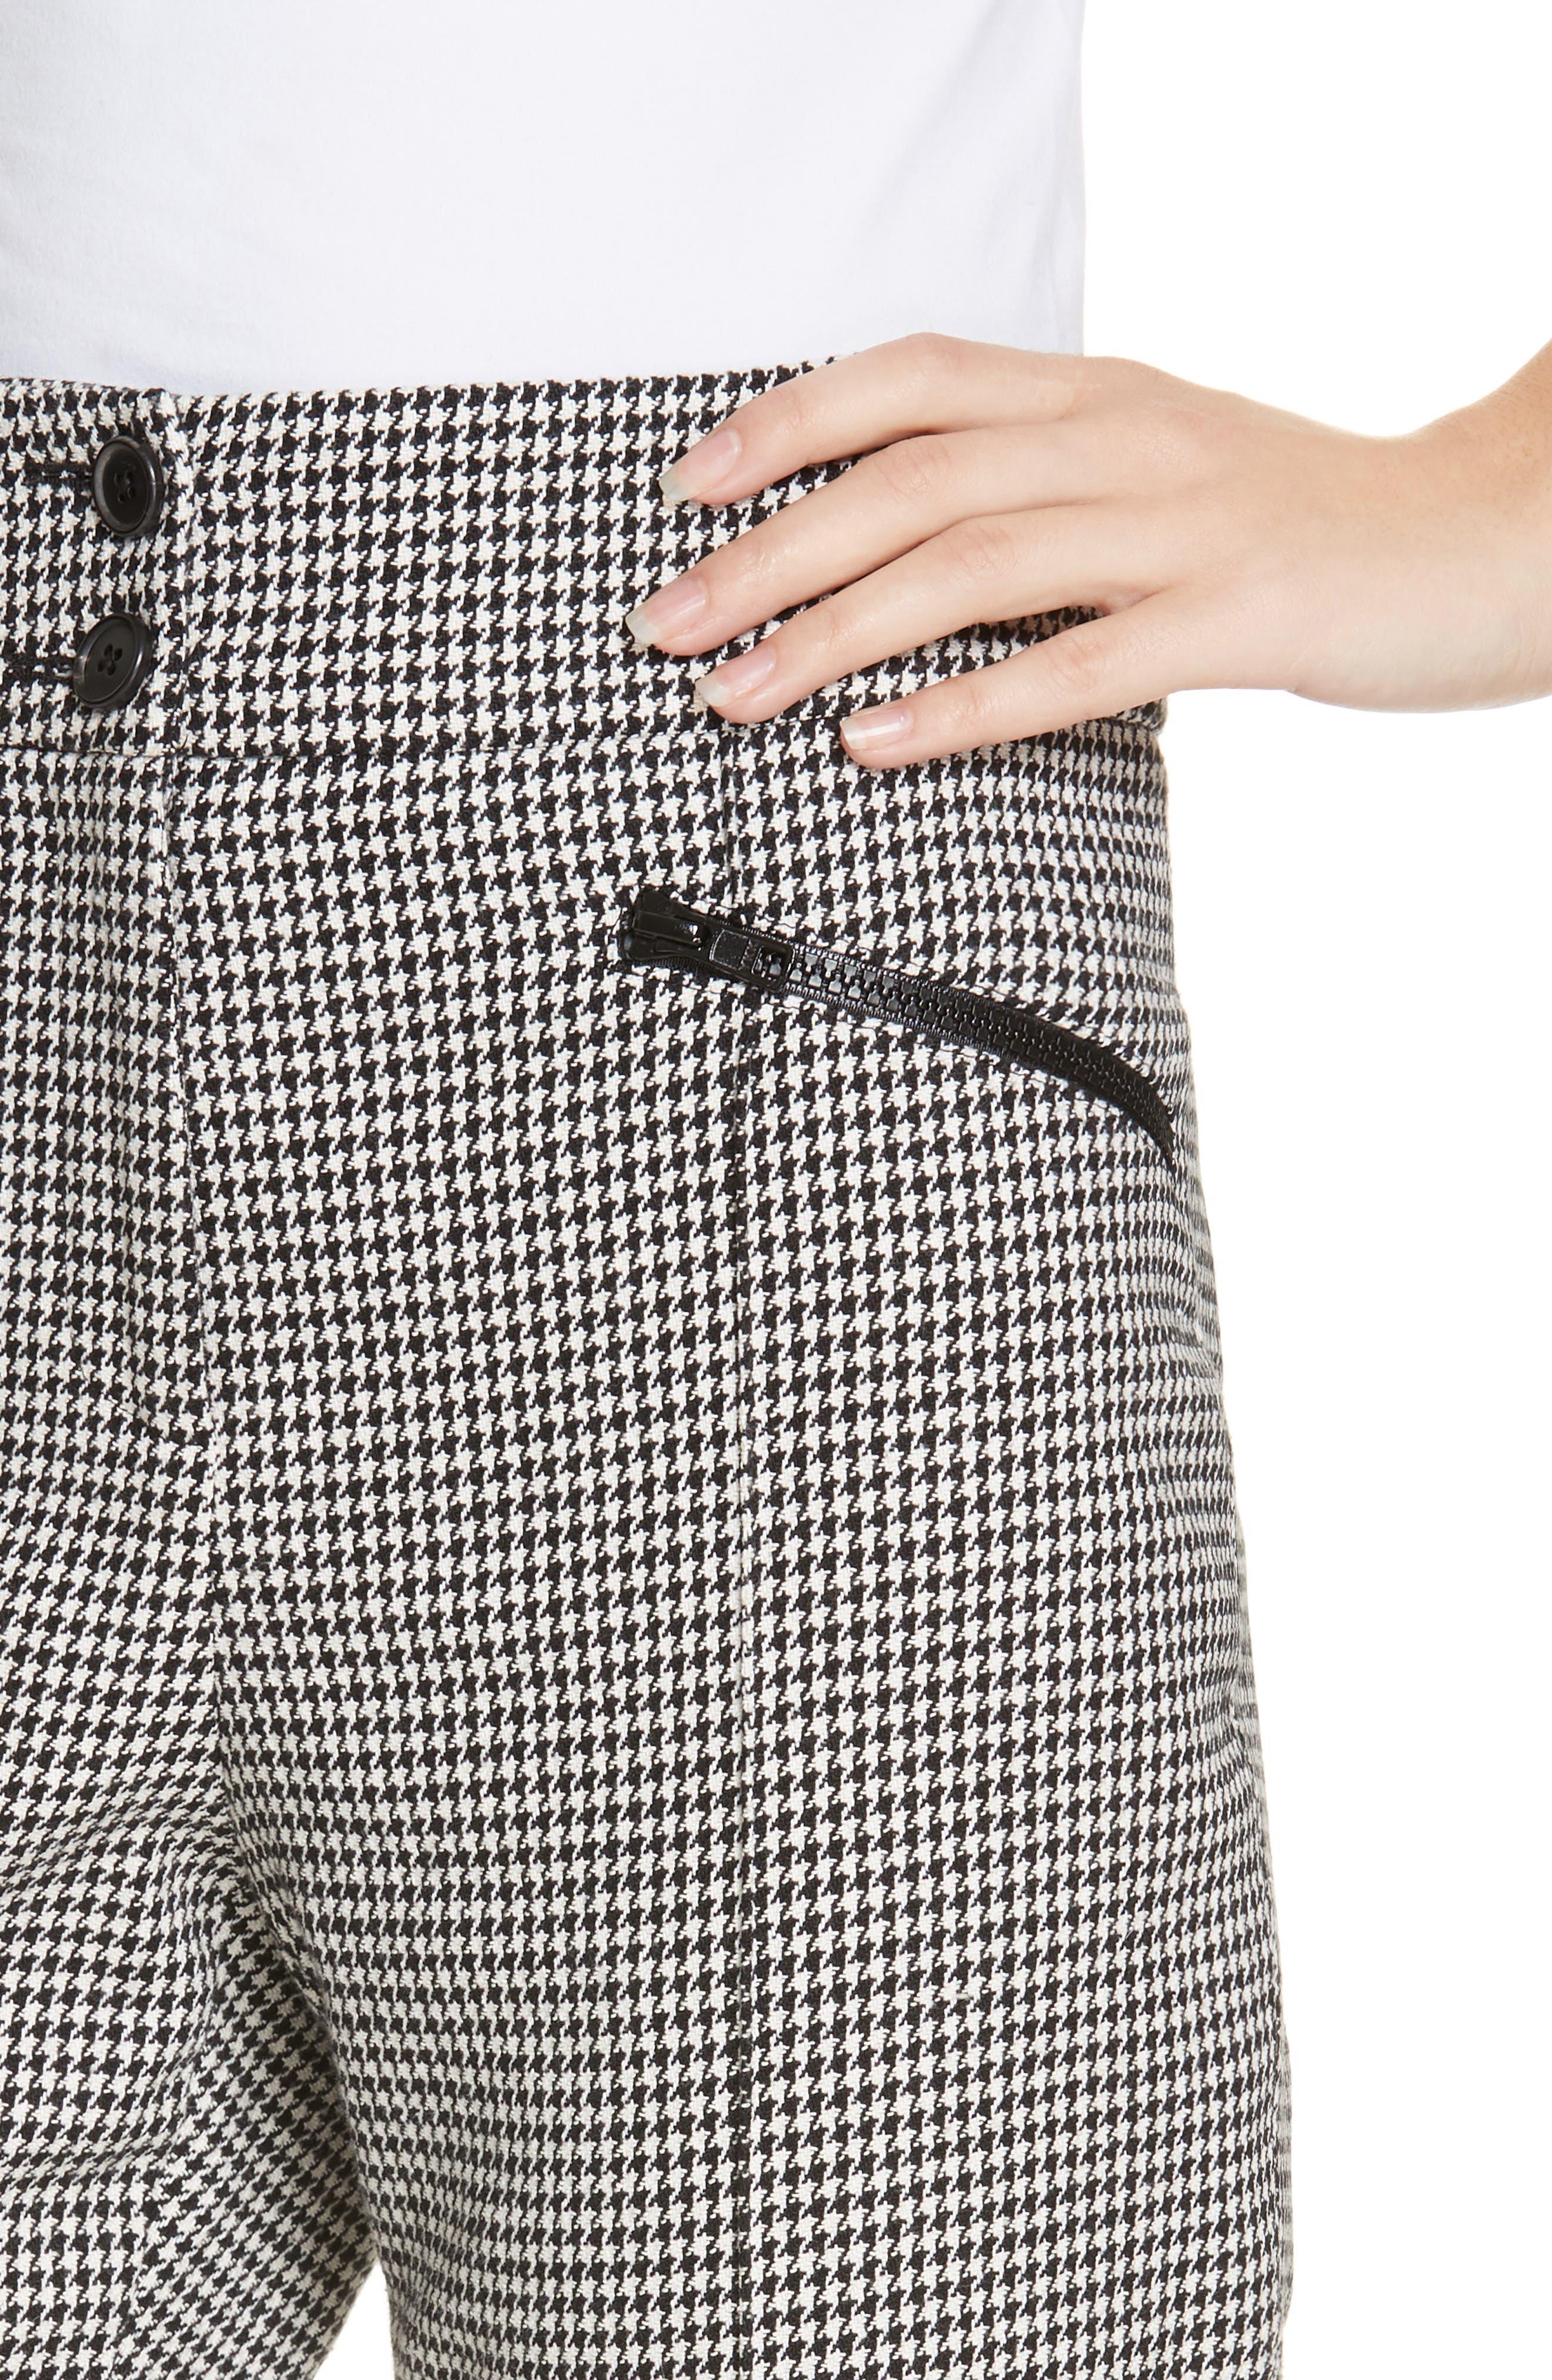 Felton Houndstooth Trousers,                             Alternate thumbnail 4, color,                             BLACK/WHITE